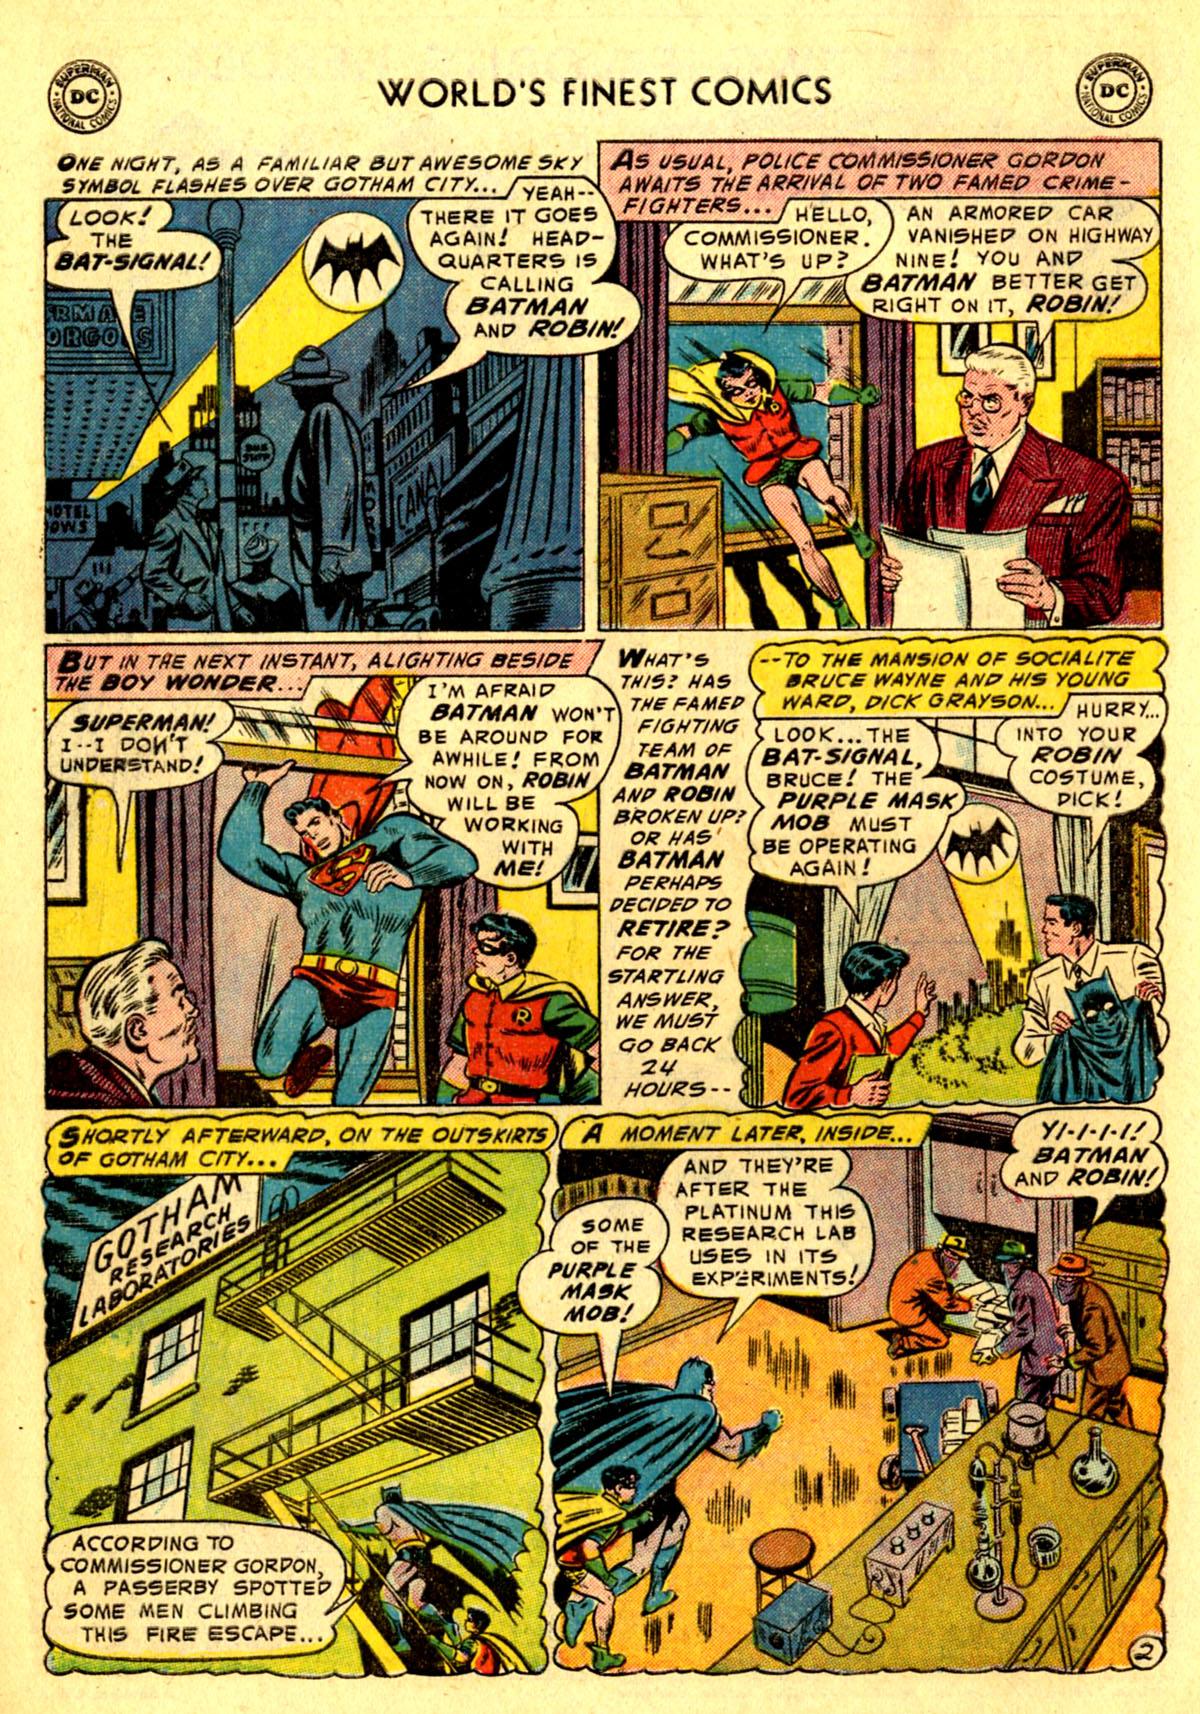 Read online World's Finest Comics comic -  Issue #75 - 4